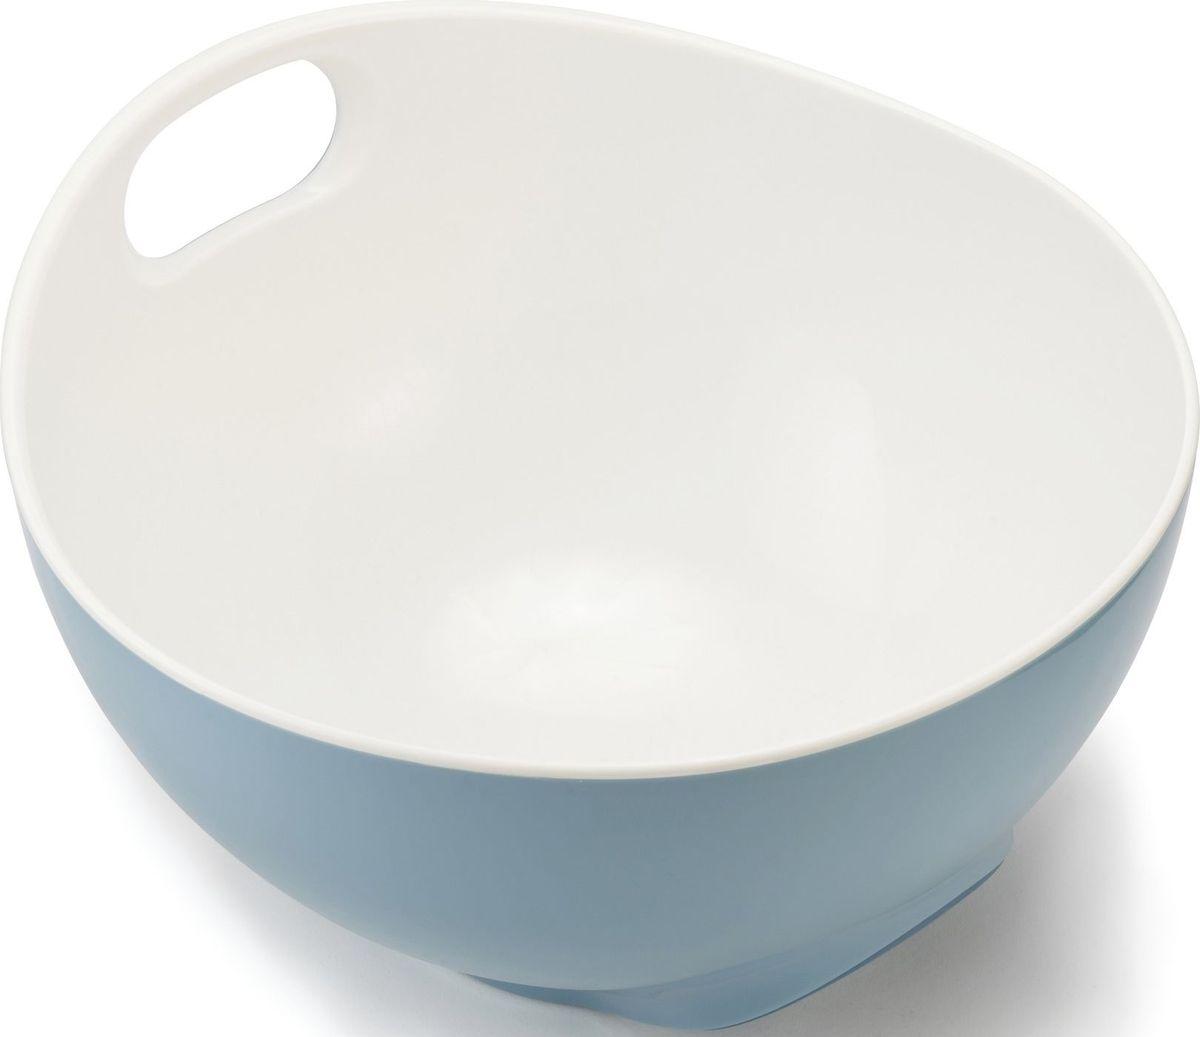 "Миска Joseph Joseph ""Tilt"", цвет: голубой, 4 л"